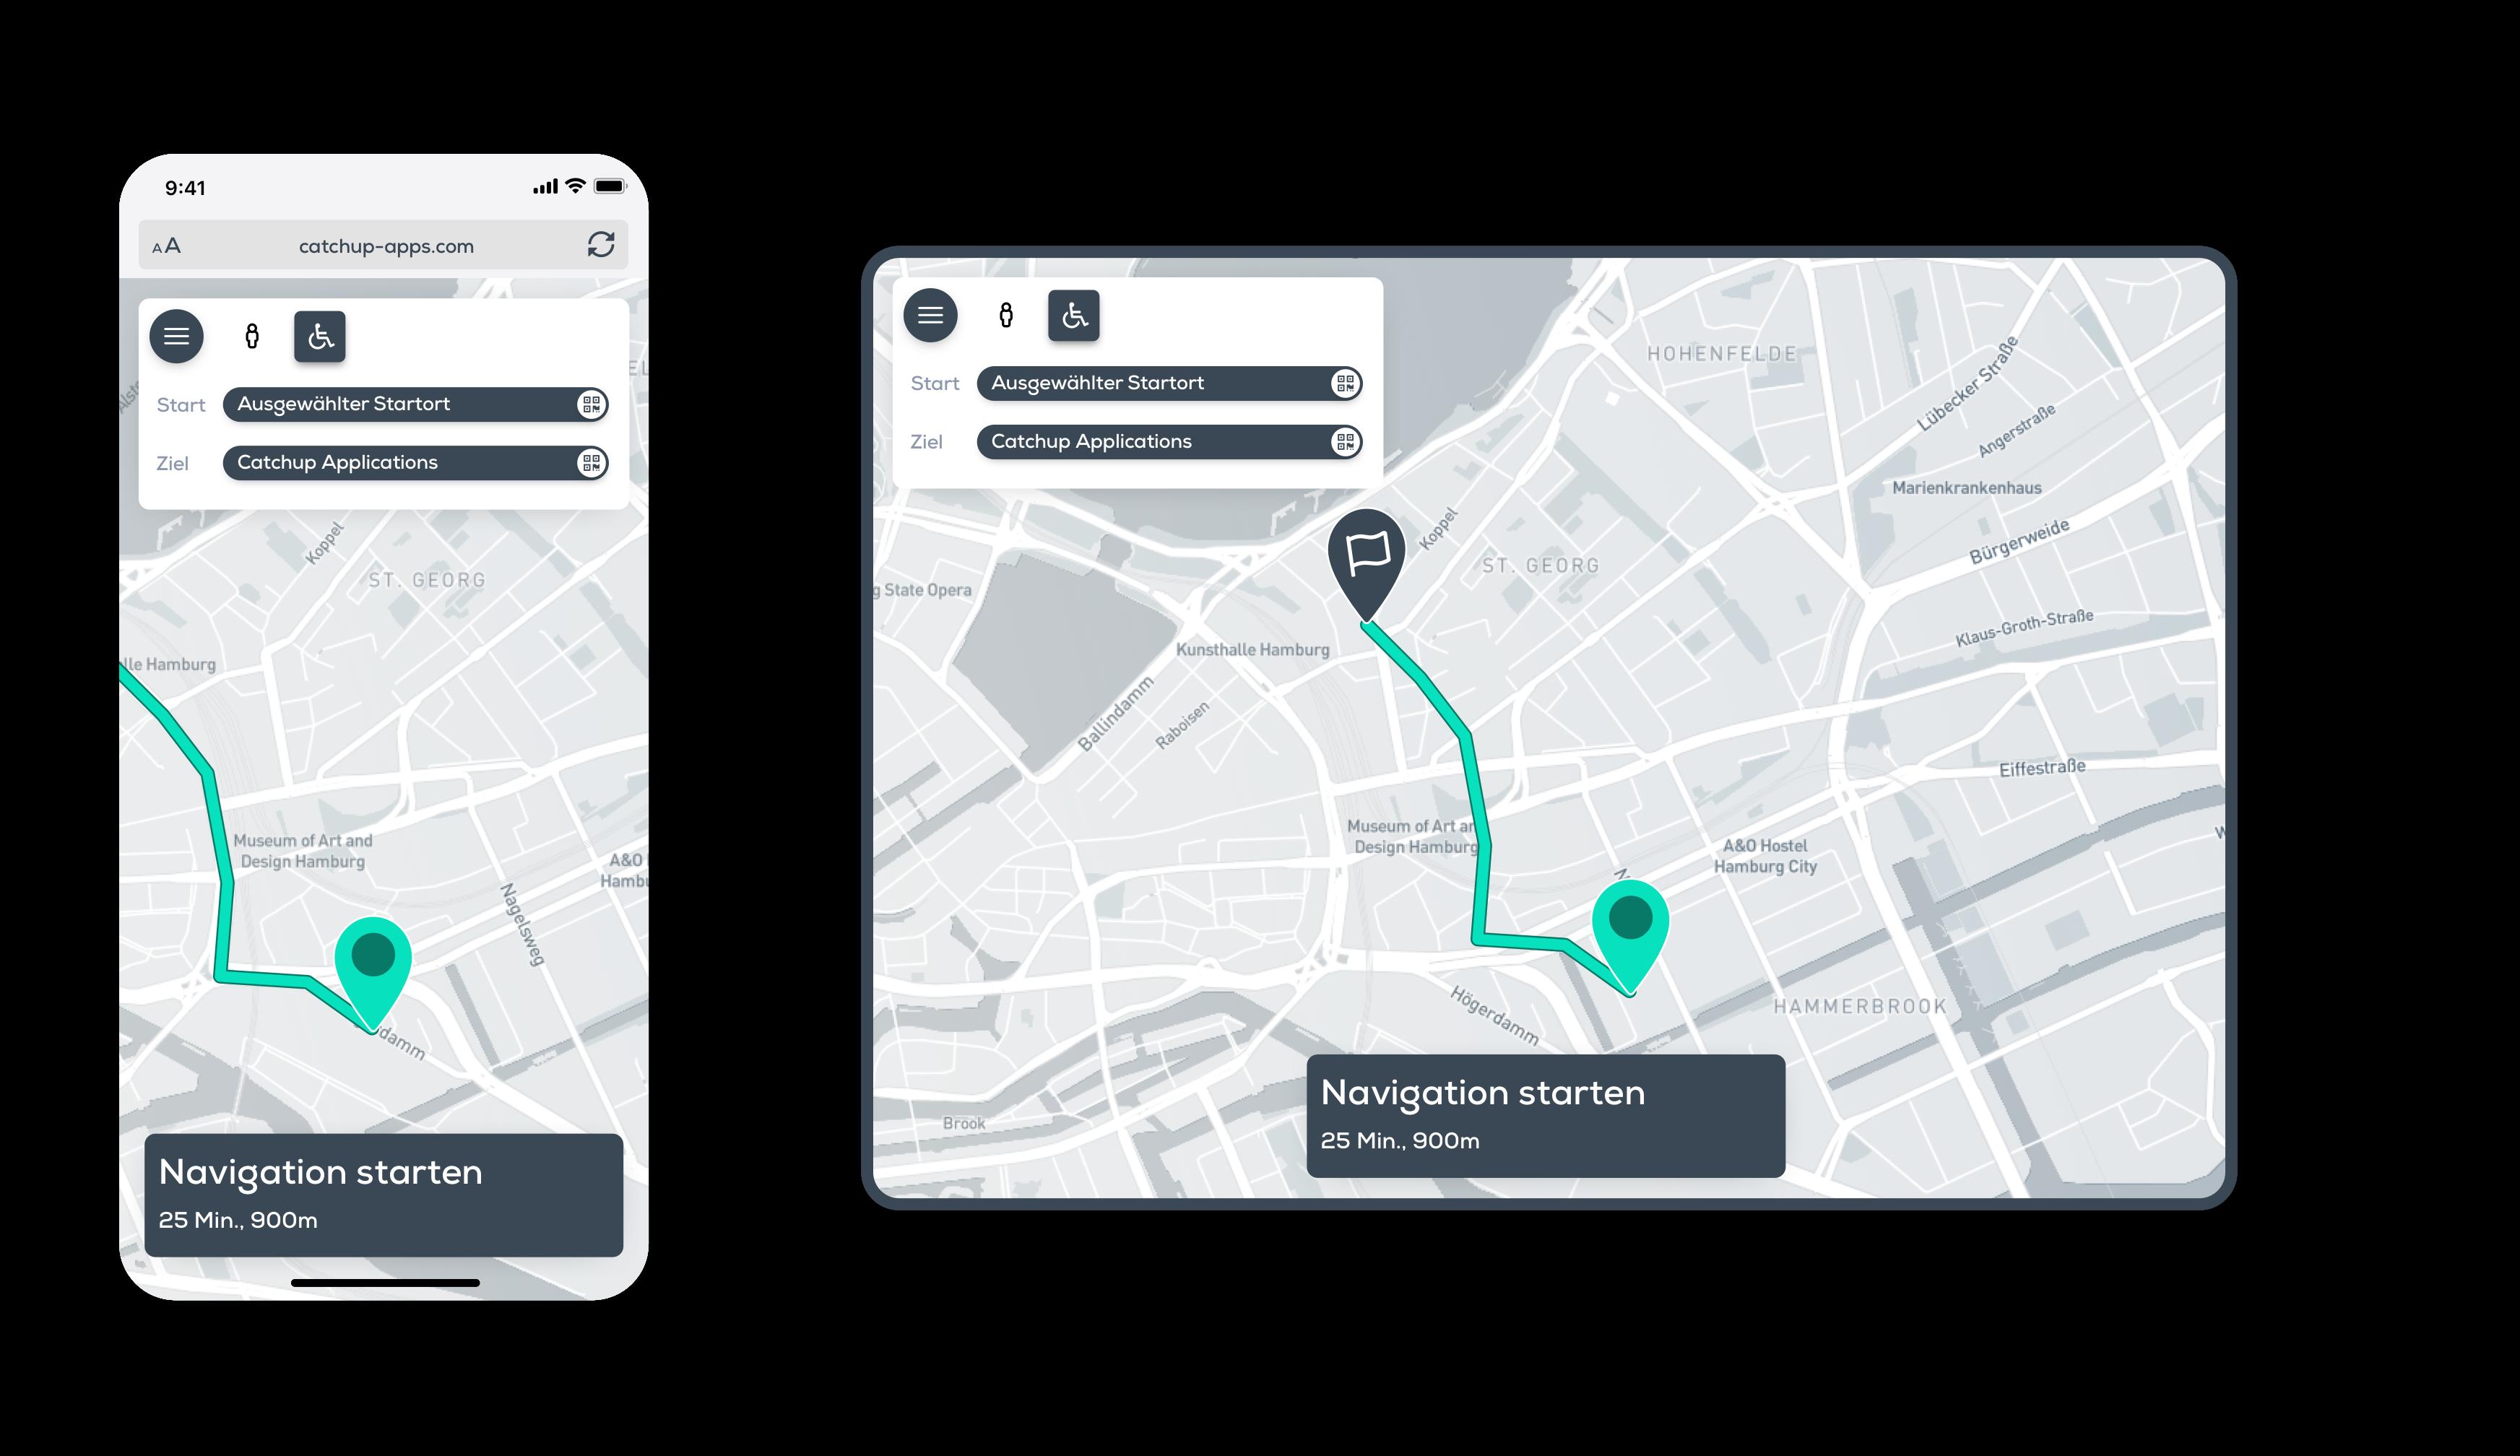 hospital app, indoor, outdoor, off site on site, navigation